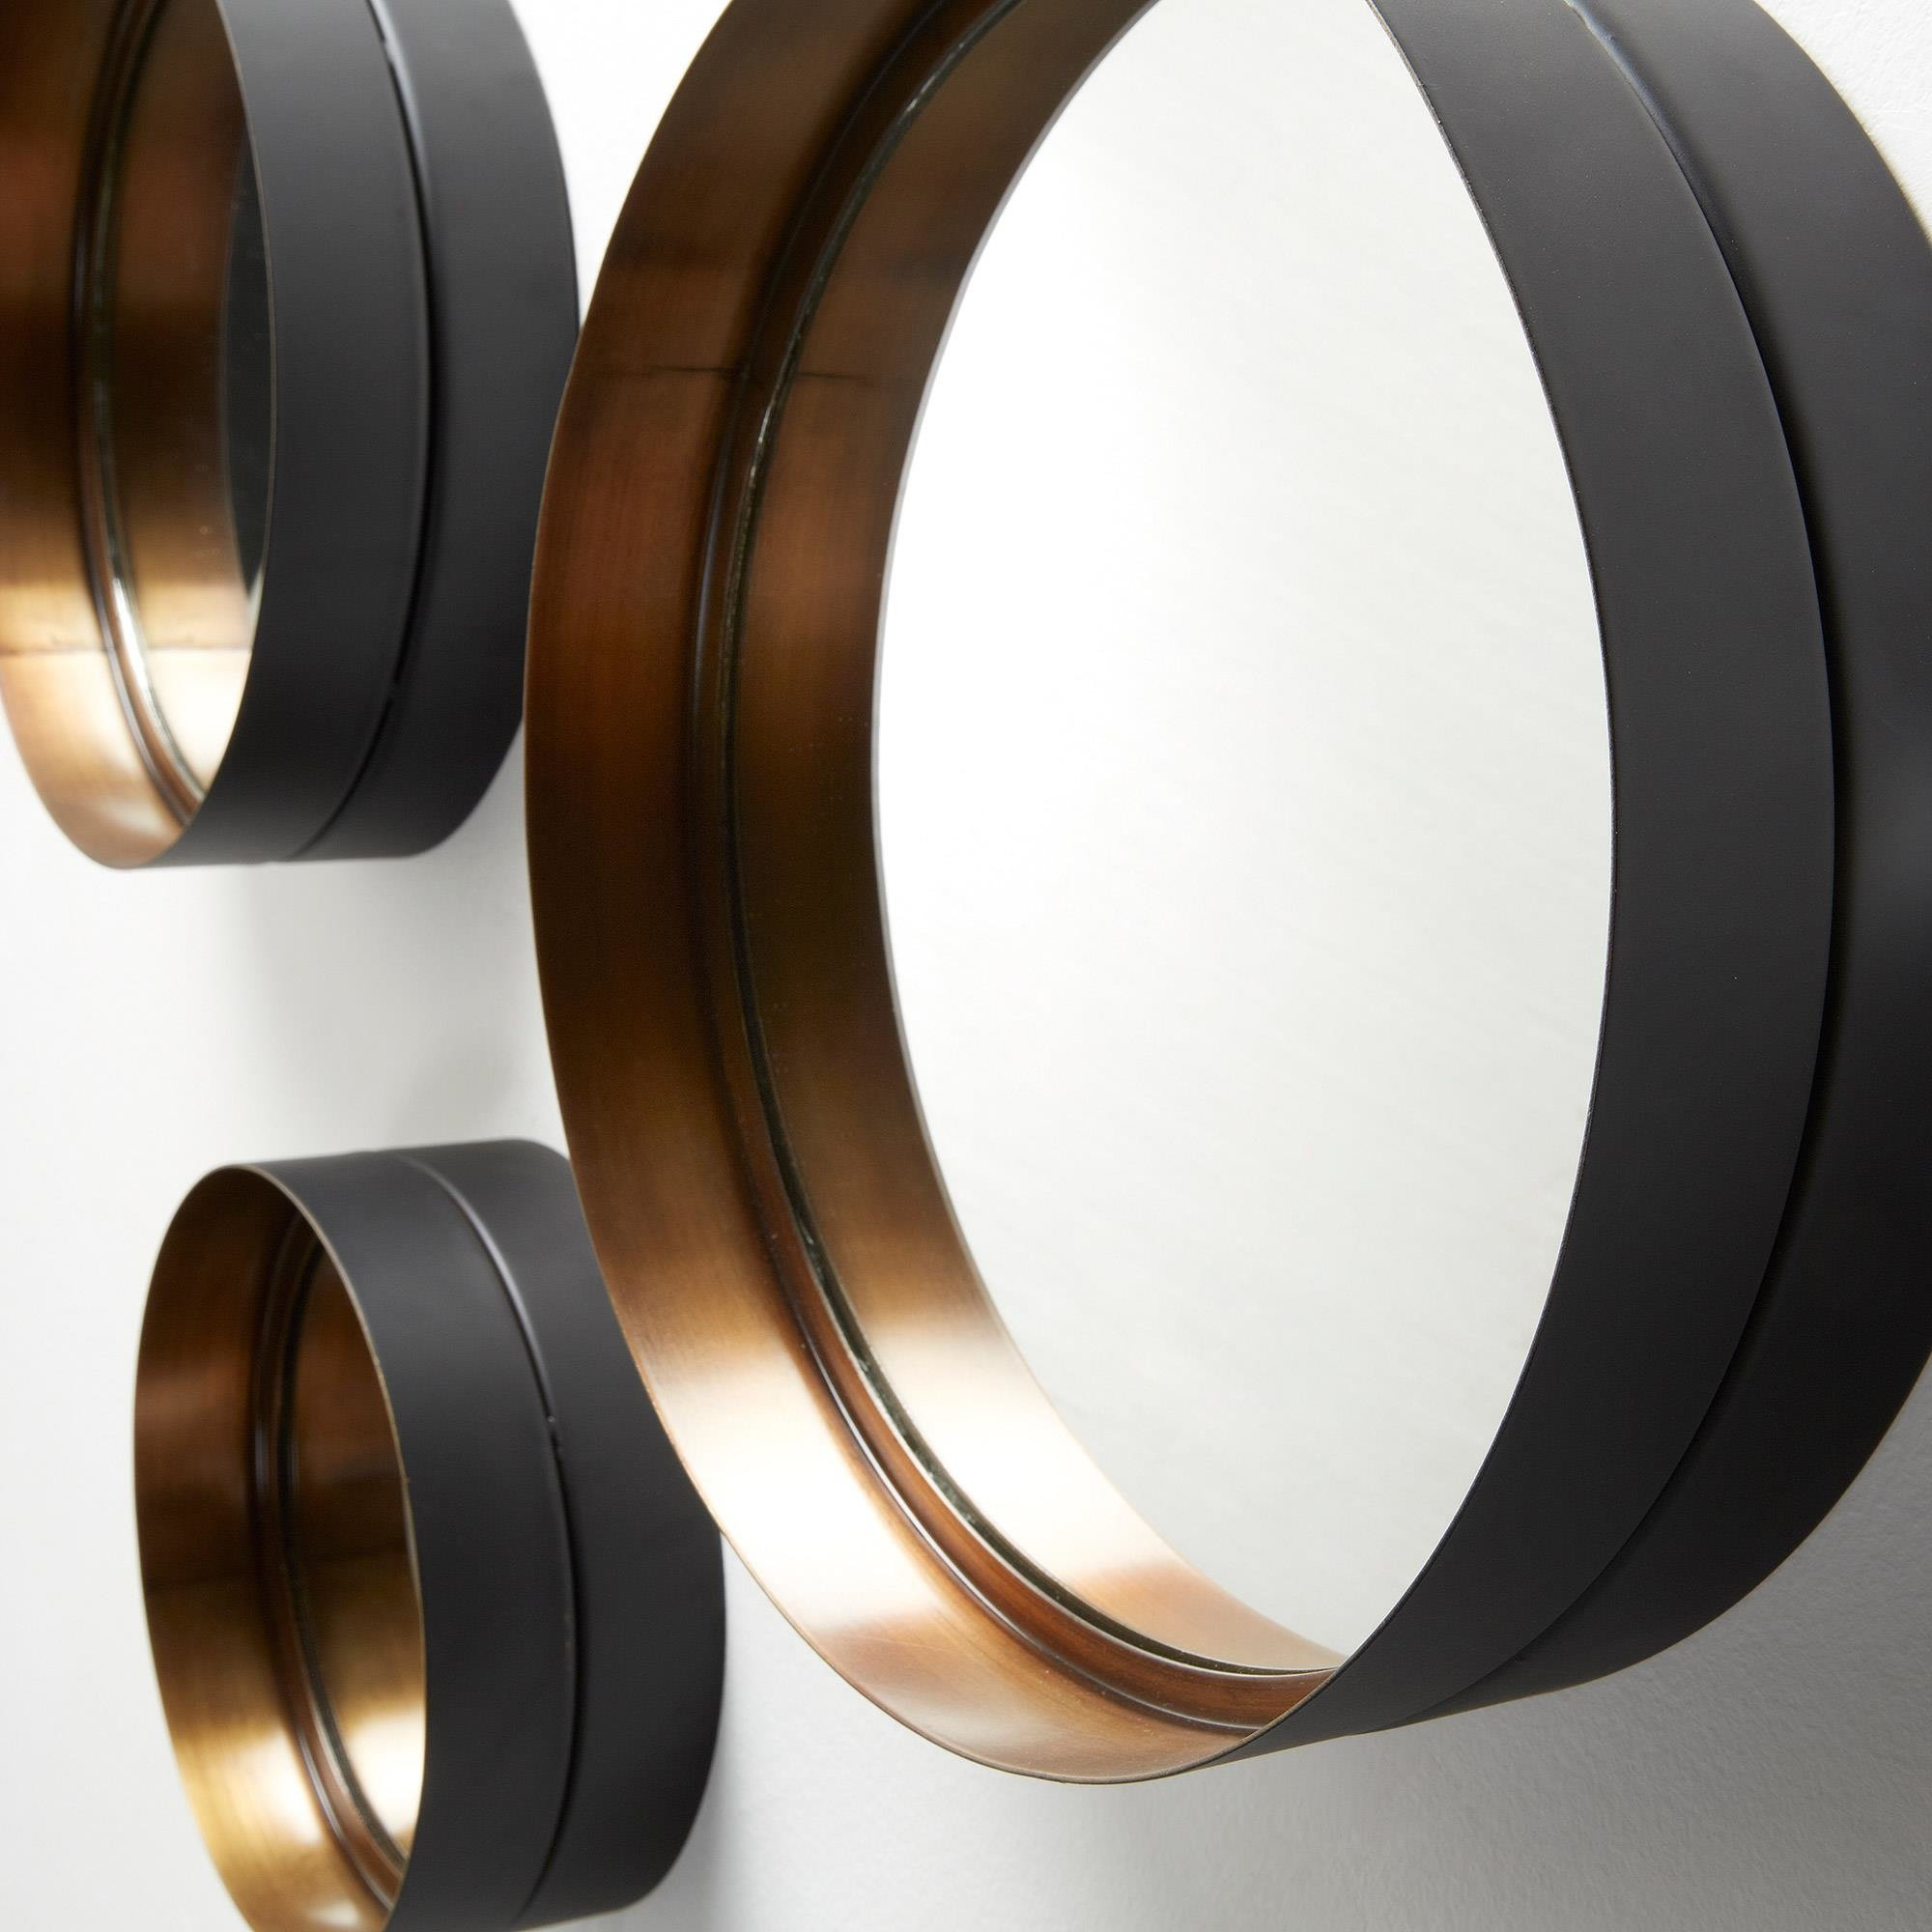 laforma wilson set 3 mirrors metal gold laforma aa0137r83 9design warszawa. Black Bedroom Furniture Sets. Home Design Ideas